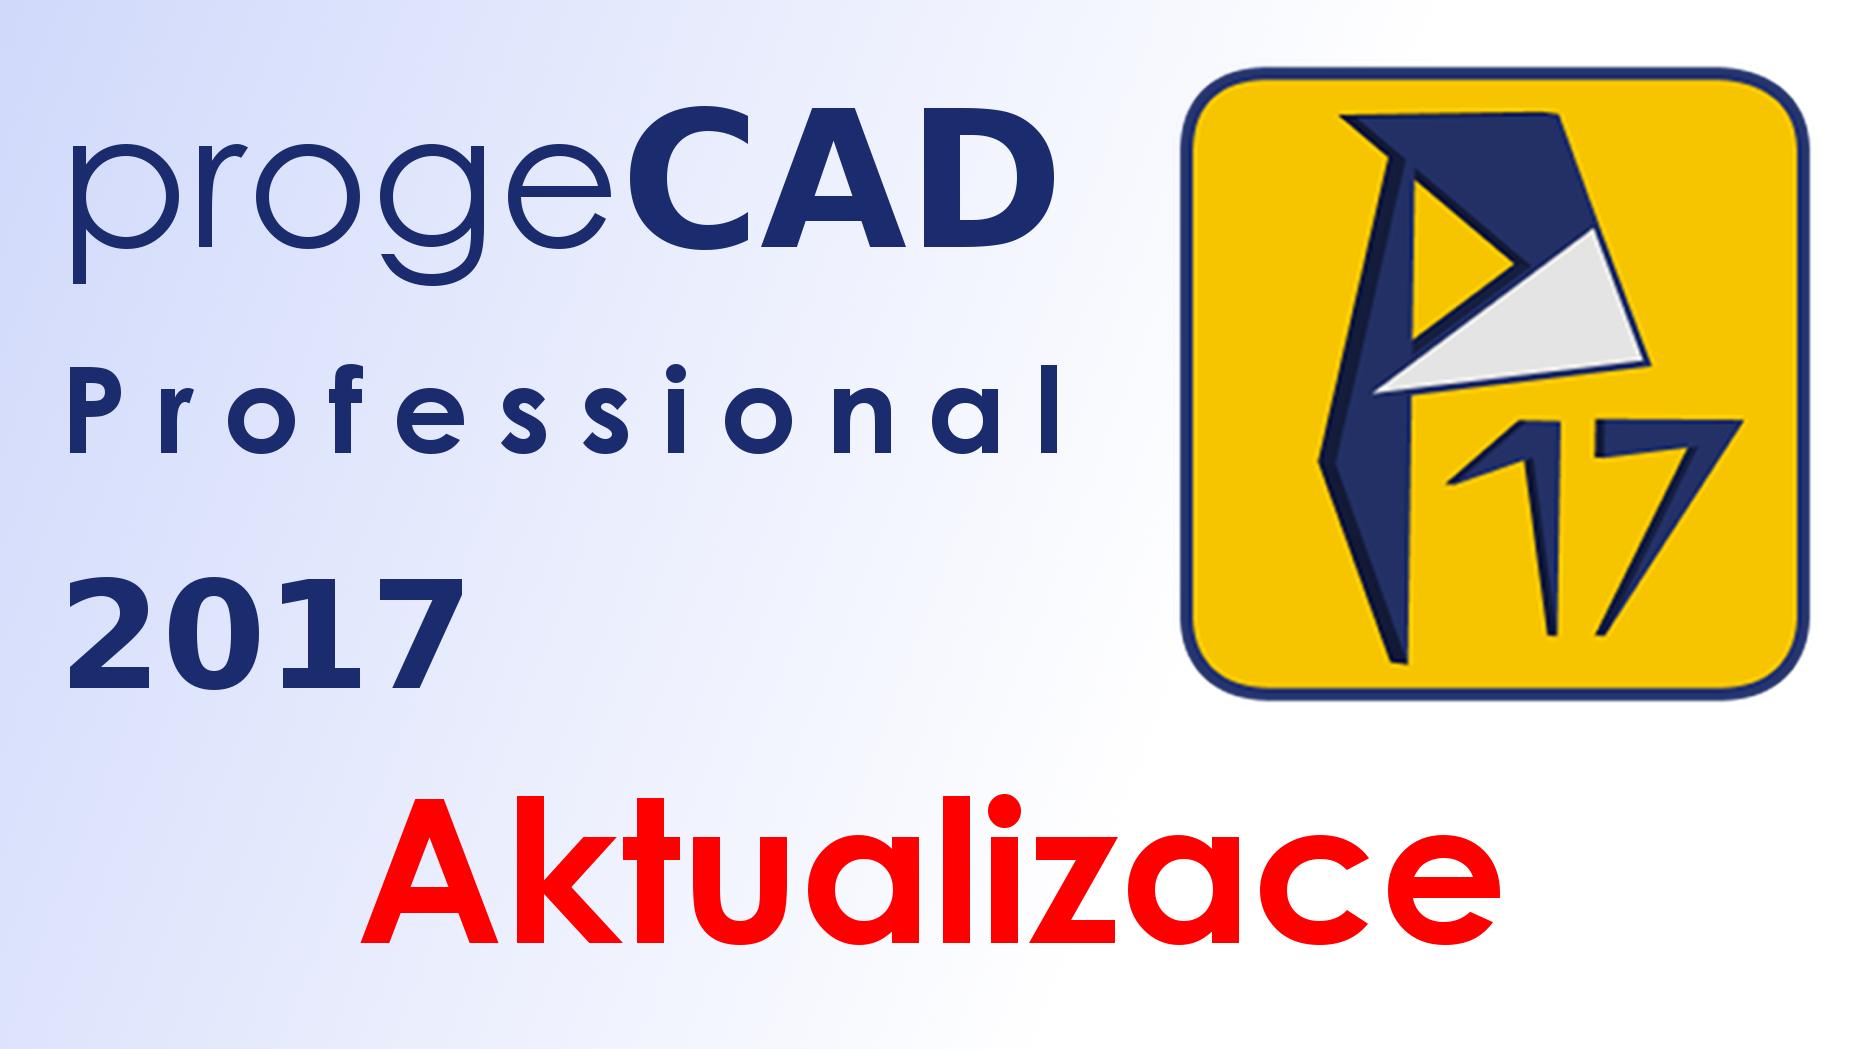 Aktualizace progeCAD 2017 Professional